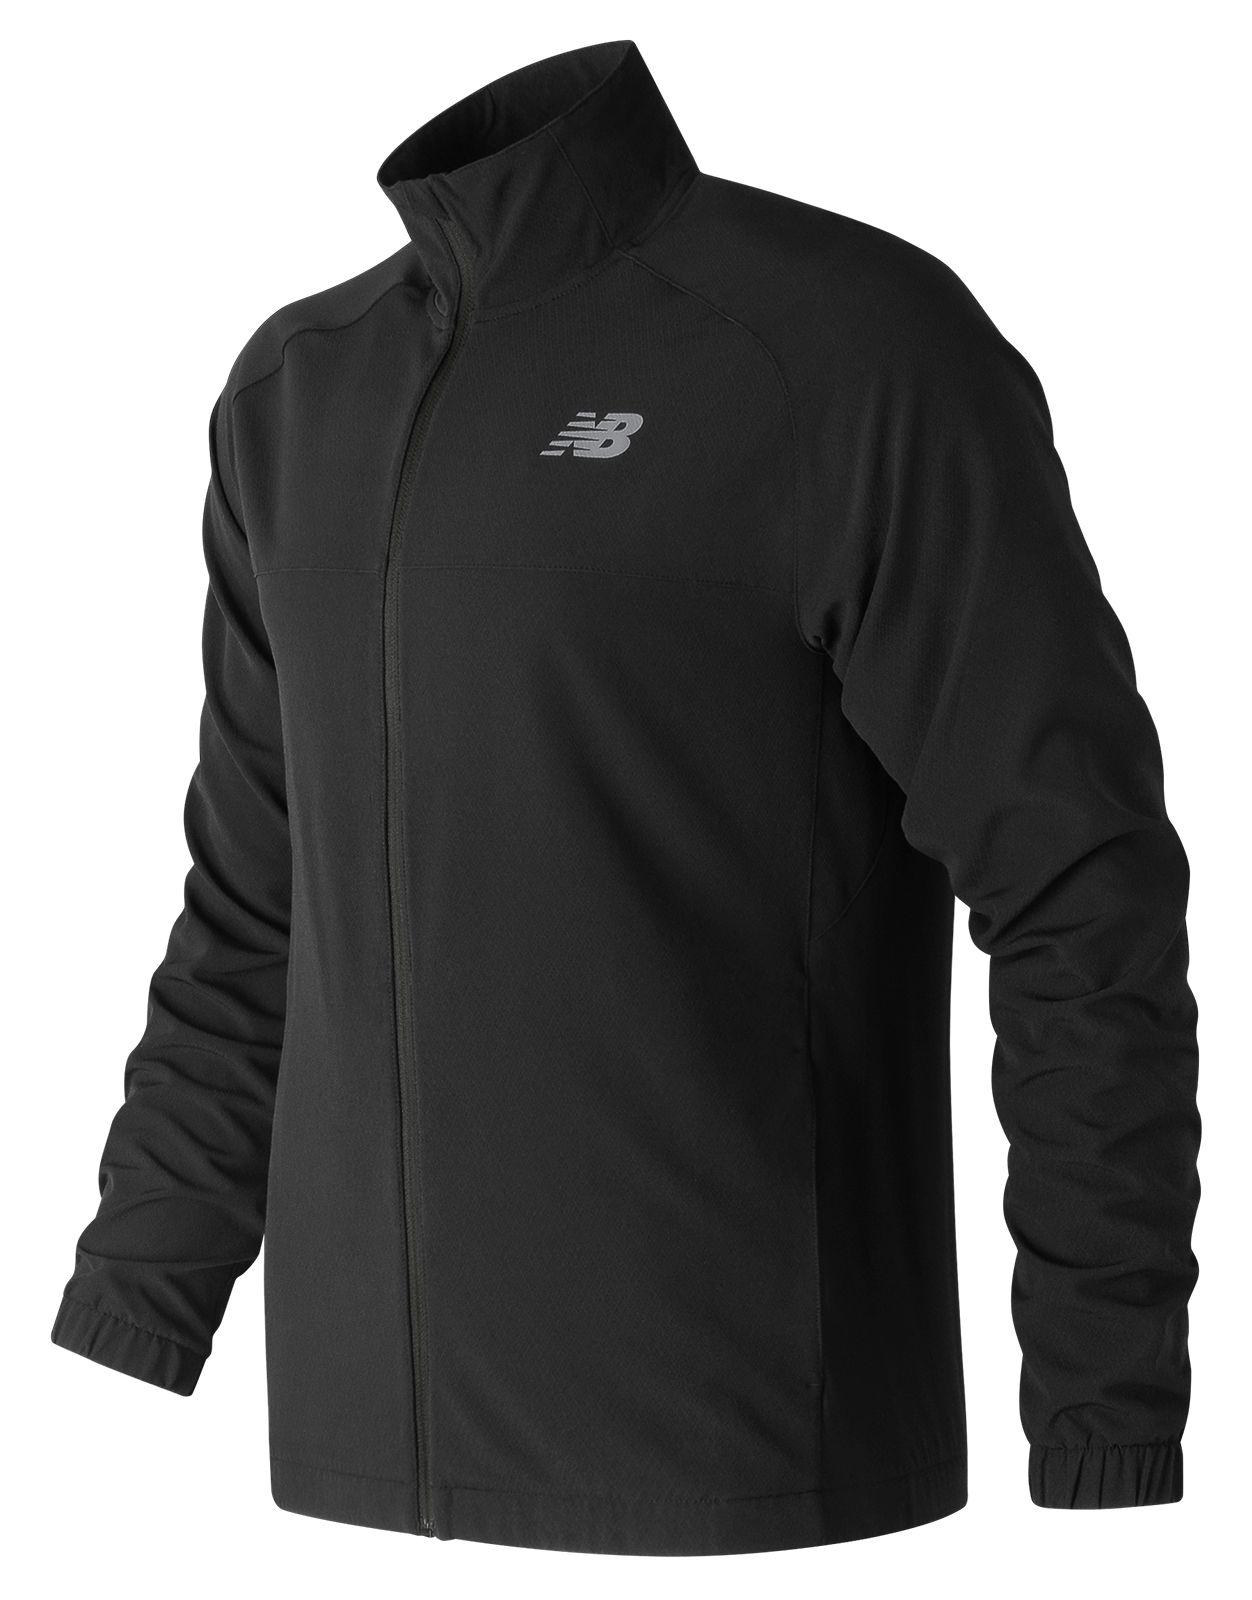 df2f95437 Details about New Balance Men's Tenacity Woven Jacket Black